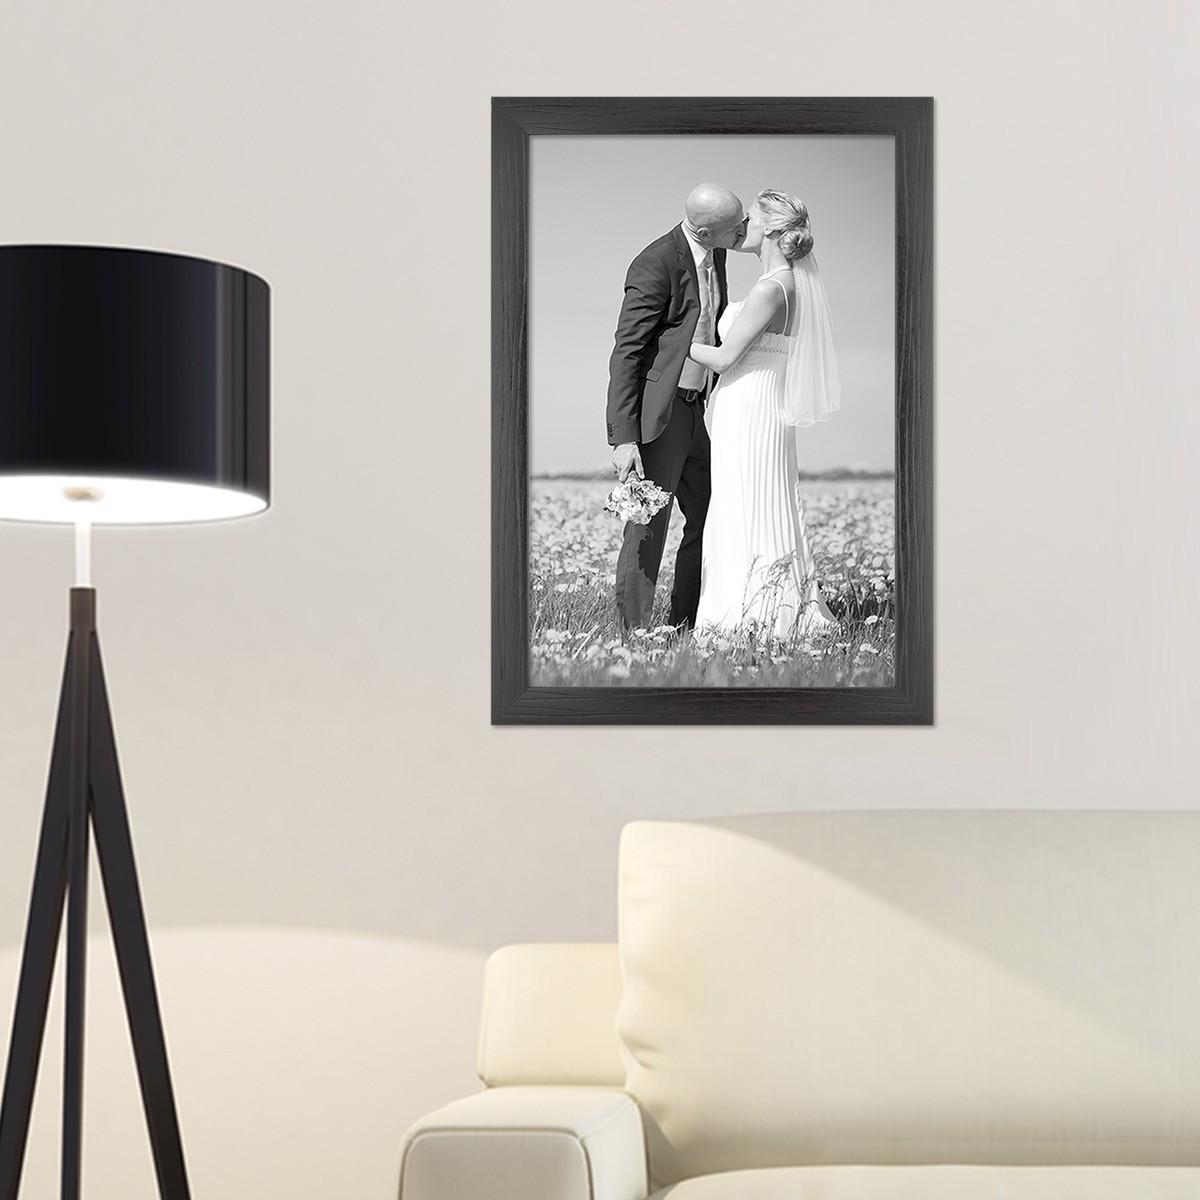 bilderrahmen modern maserung holz schwarz wei foto rahmen. Black Bedroom Furniture Sets. Home Design Ideas